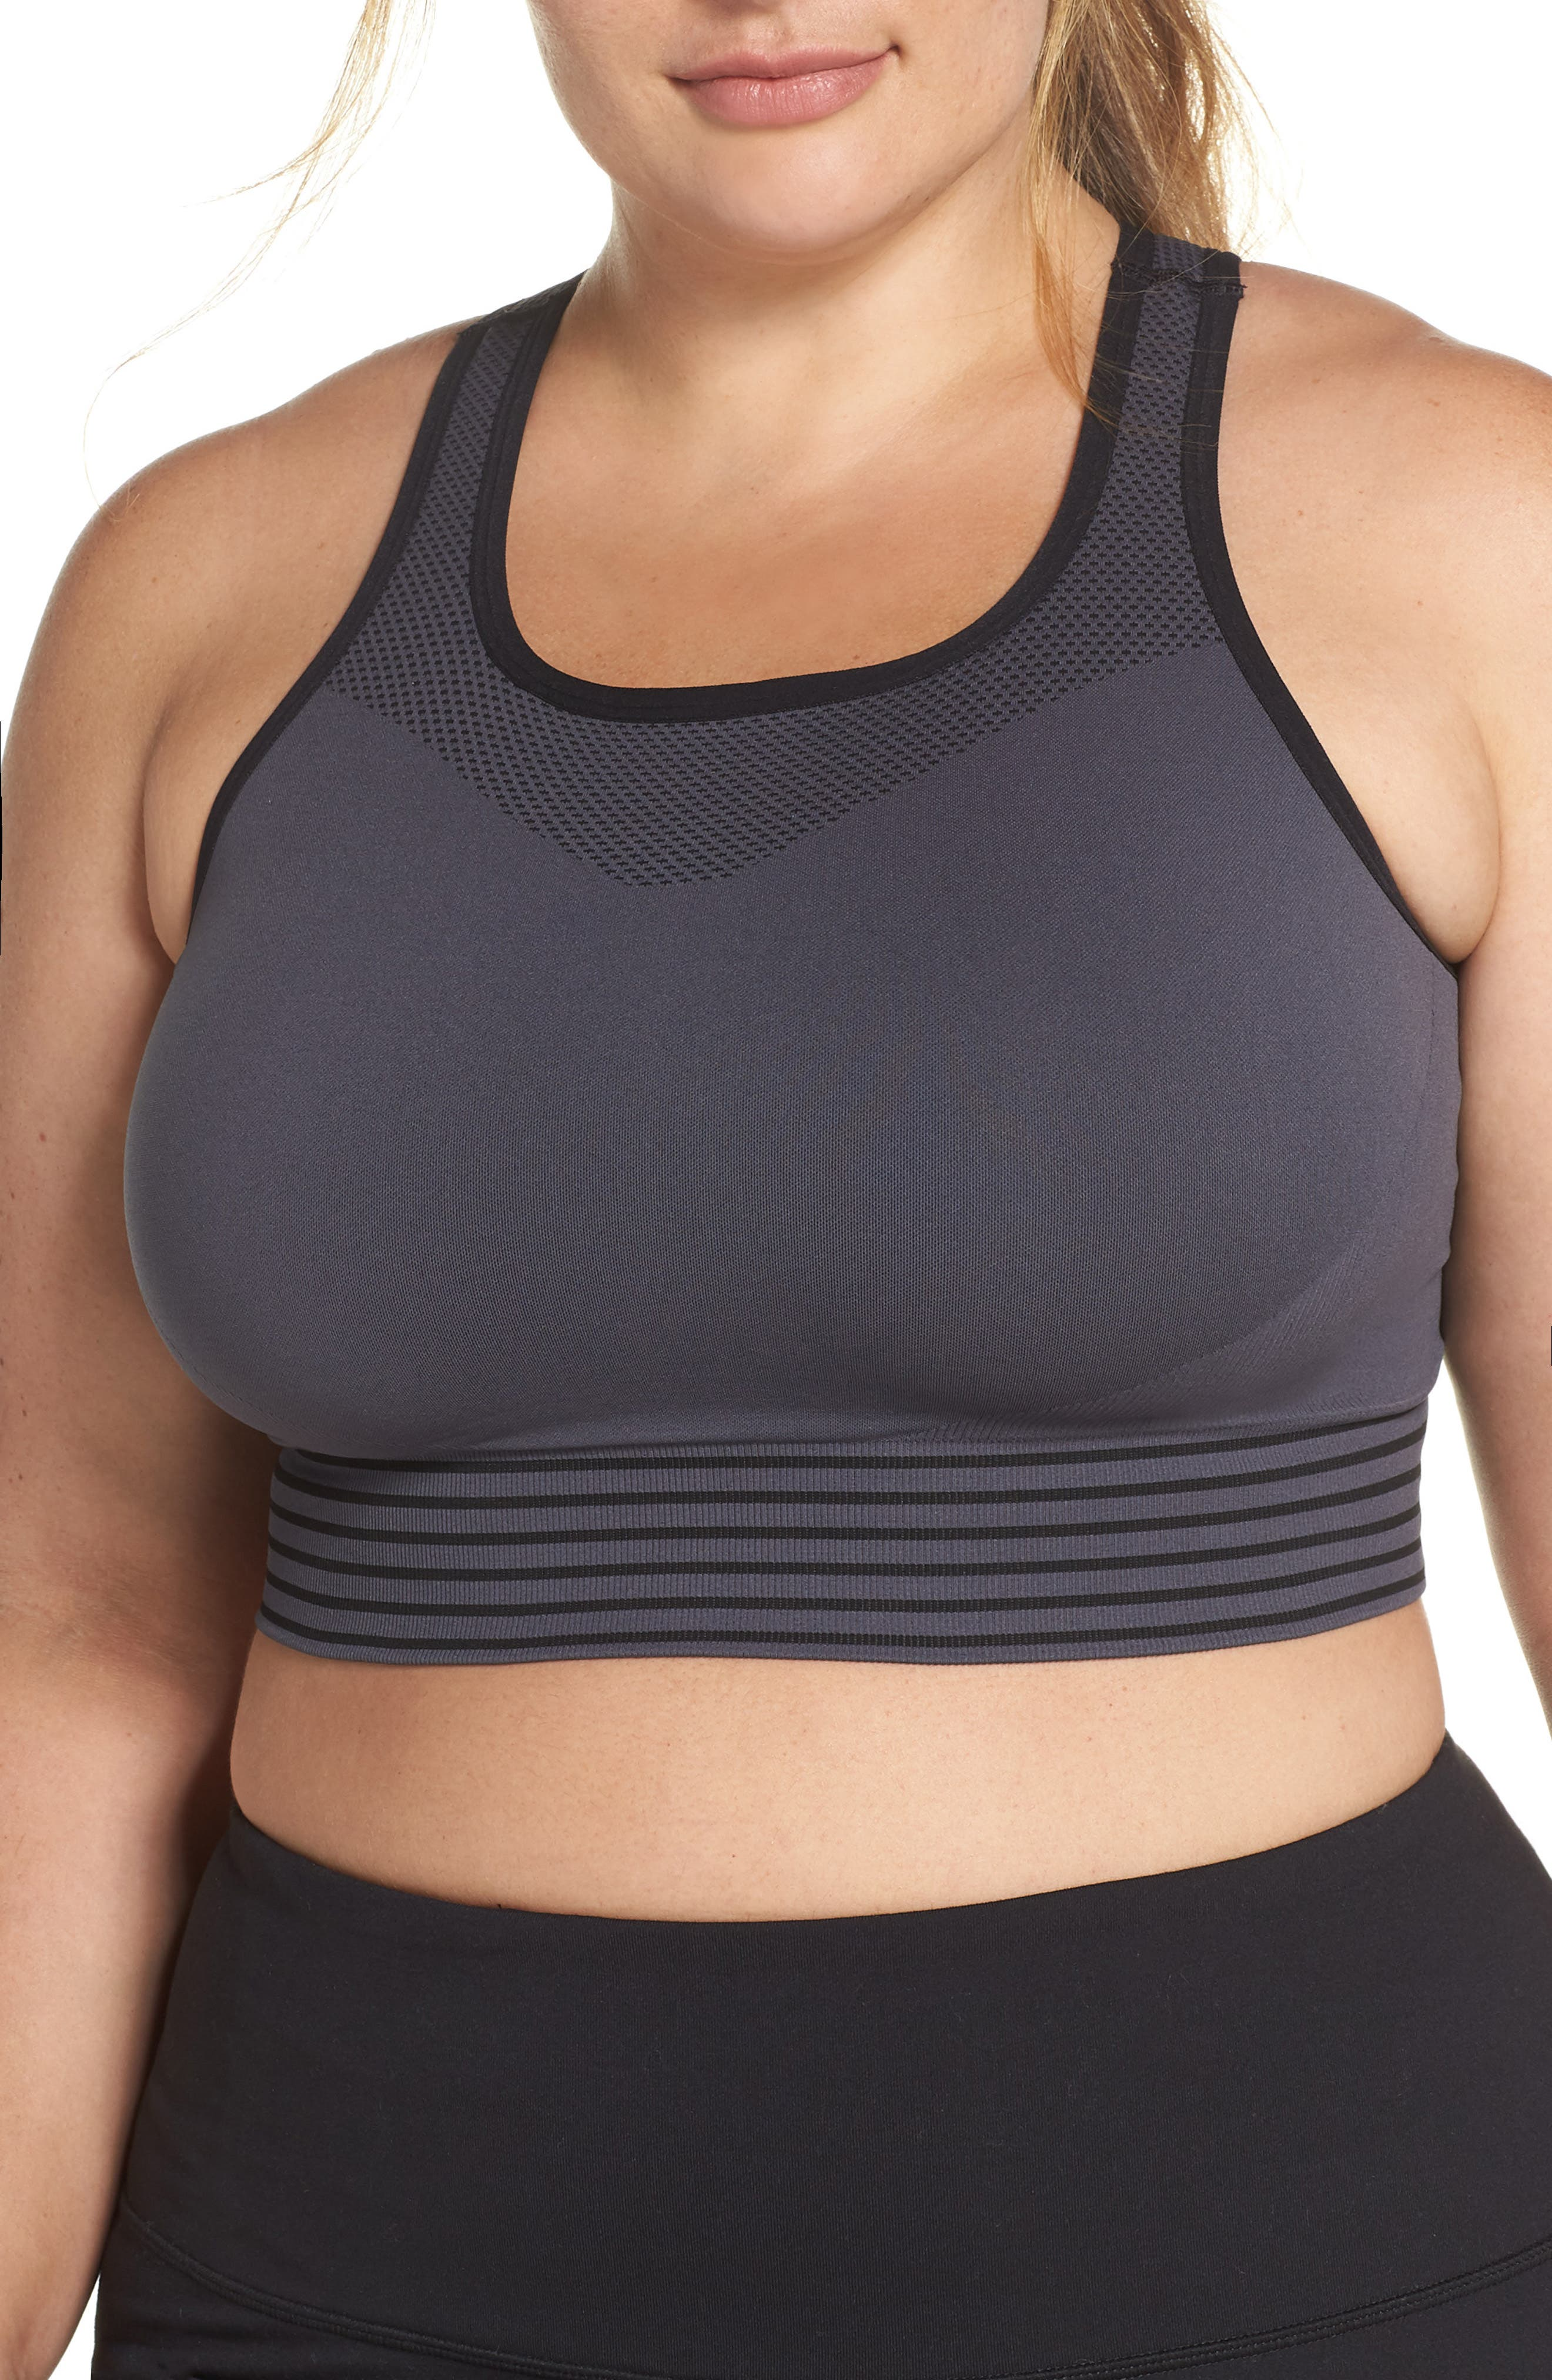 Plus Size Zella Body Fusion Sports Bra